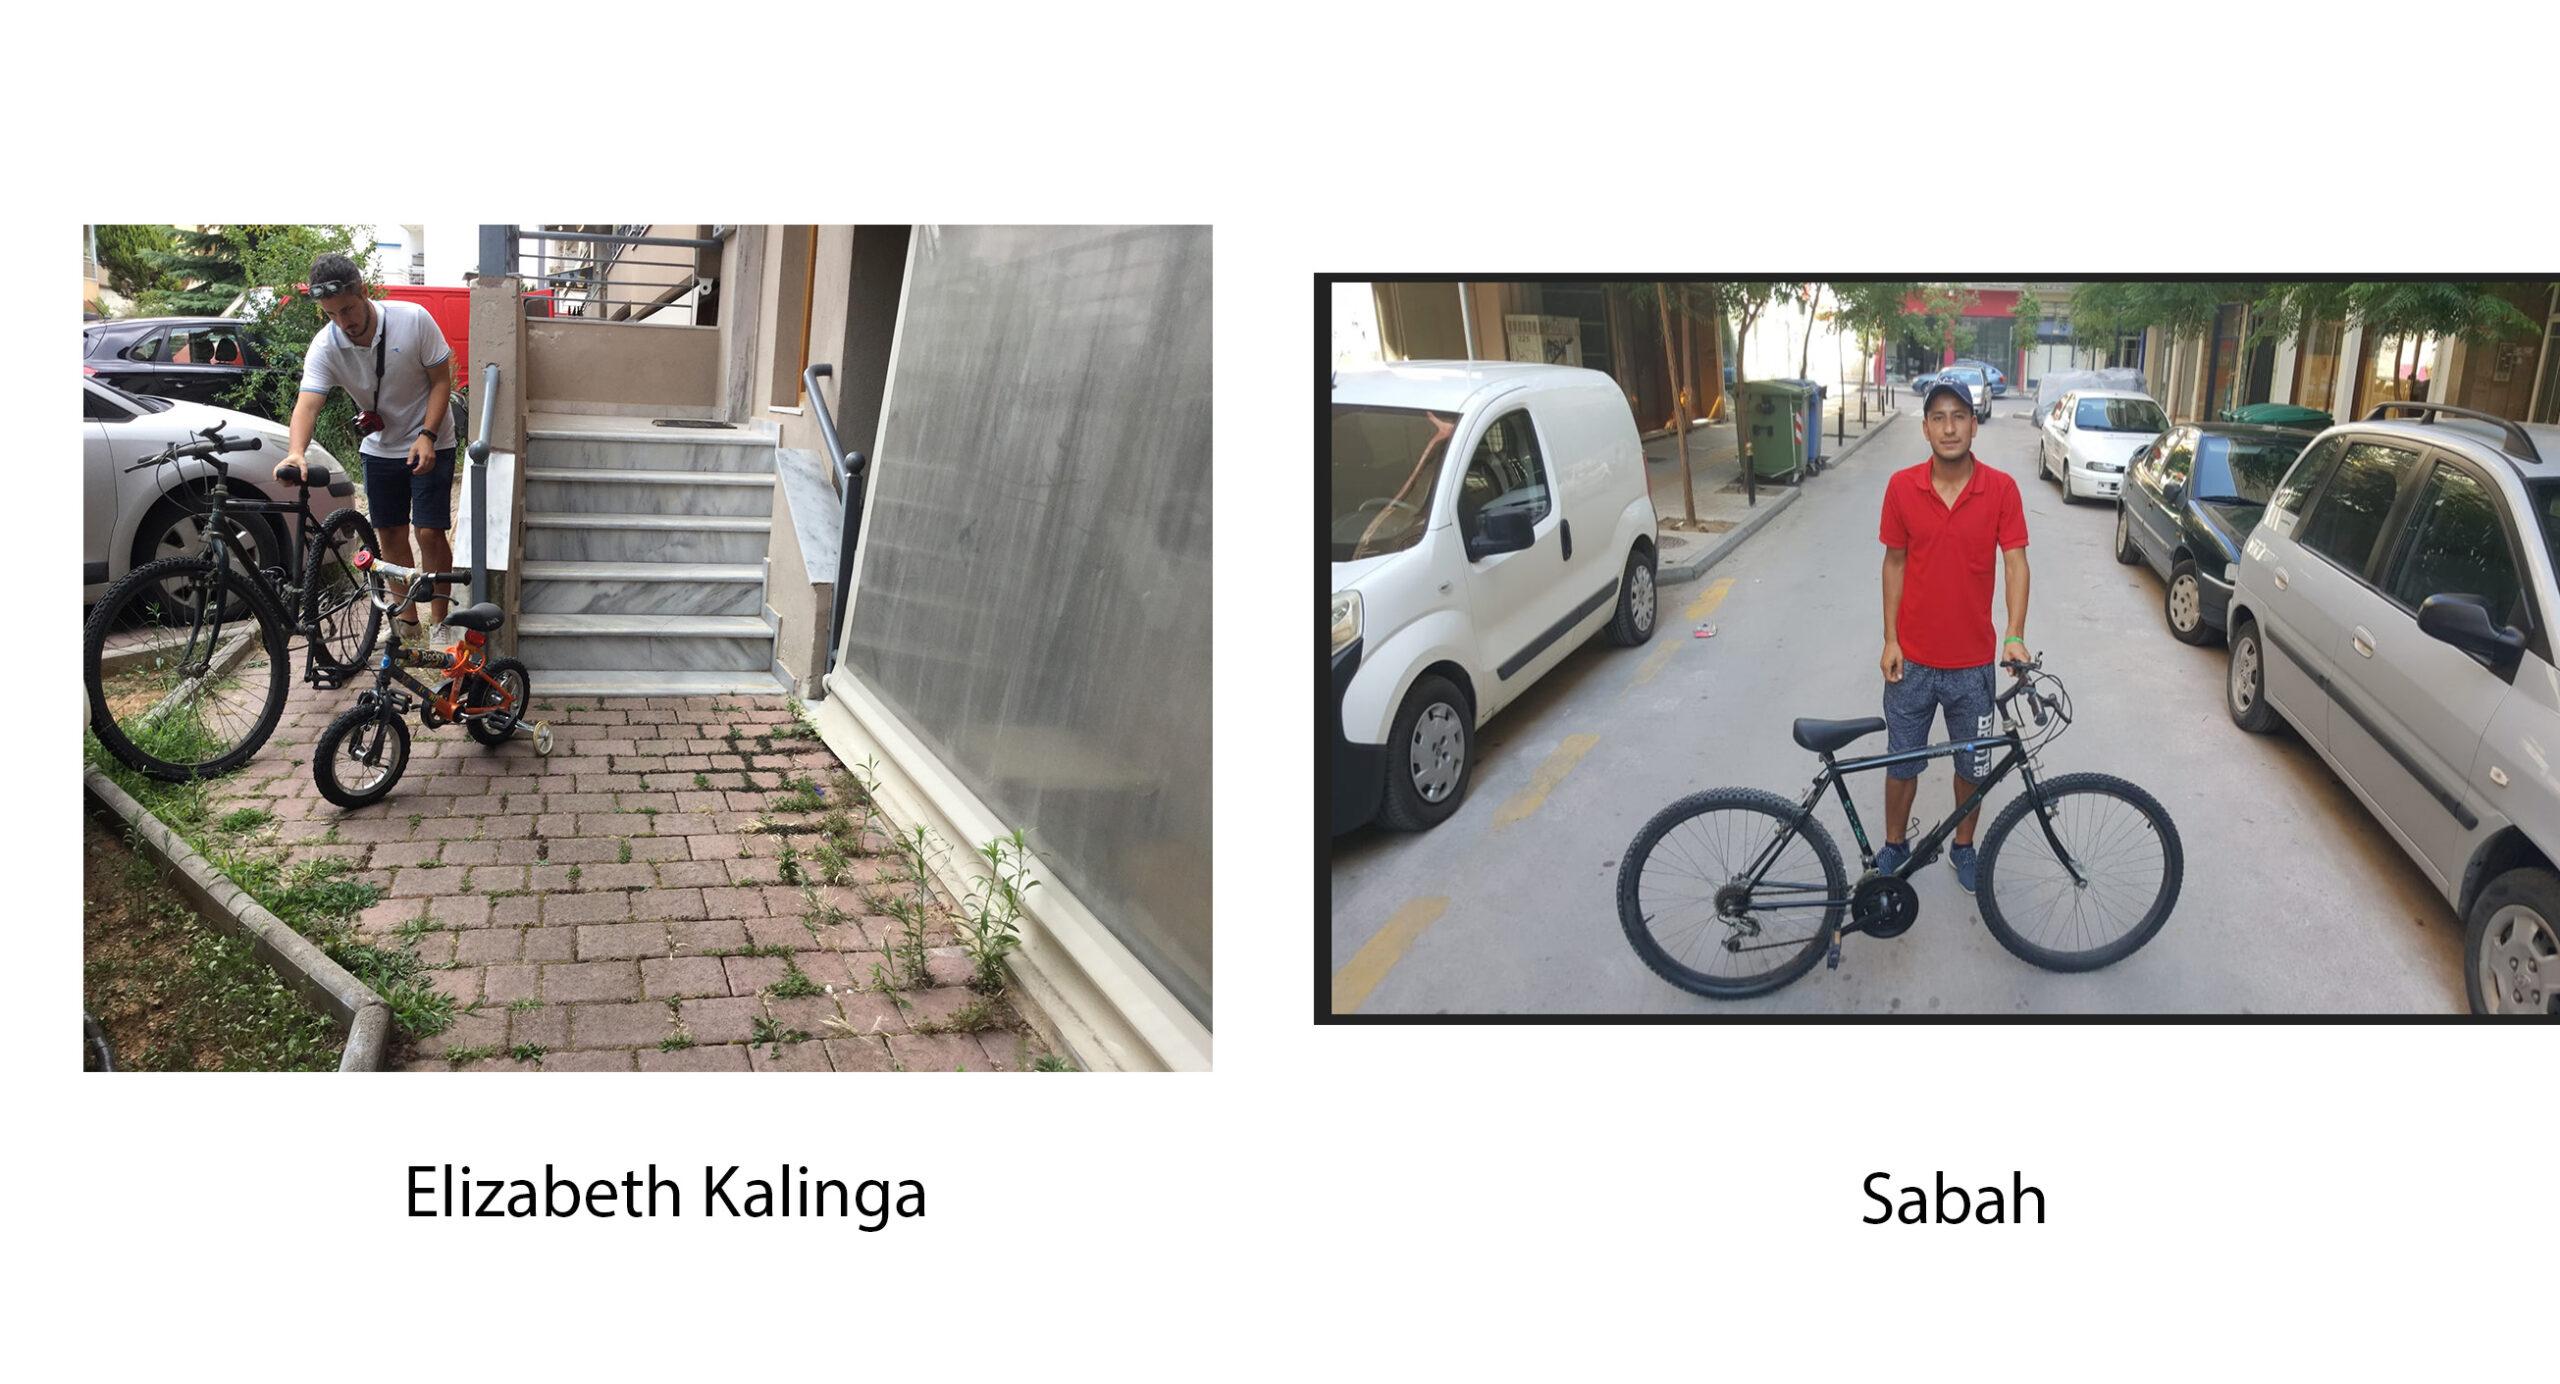 1from ELISABETH kALINGA TO SABAH the black bike